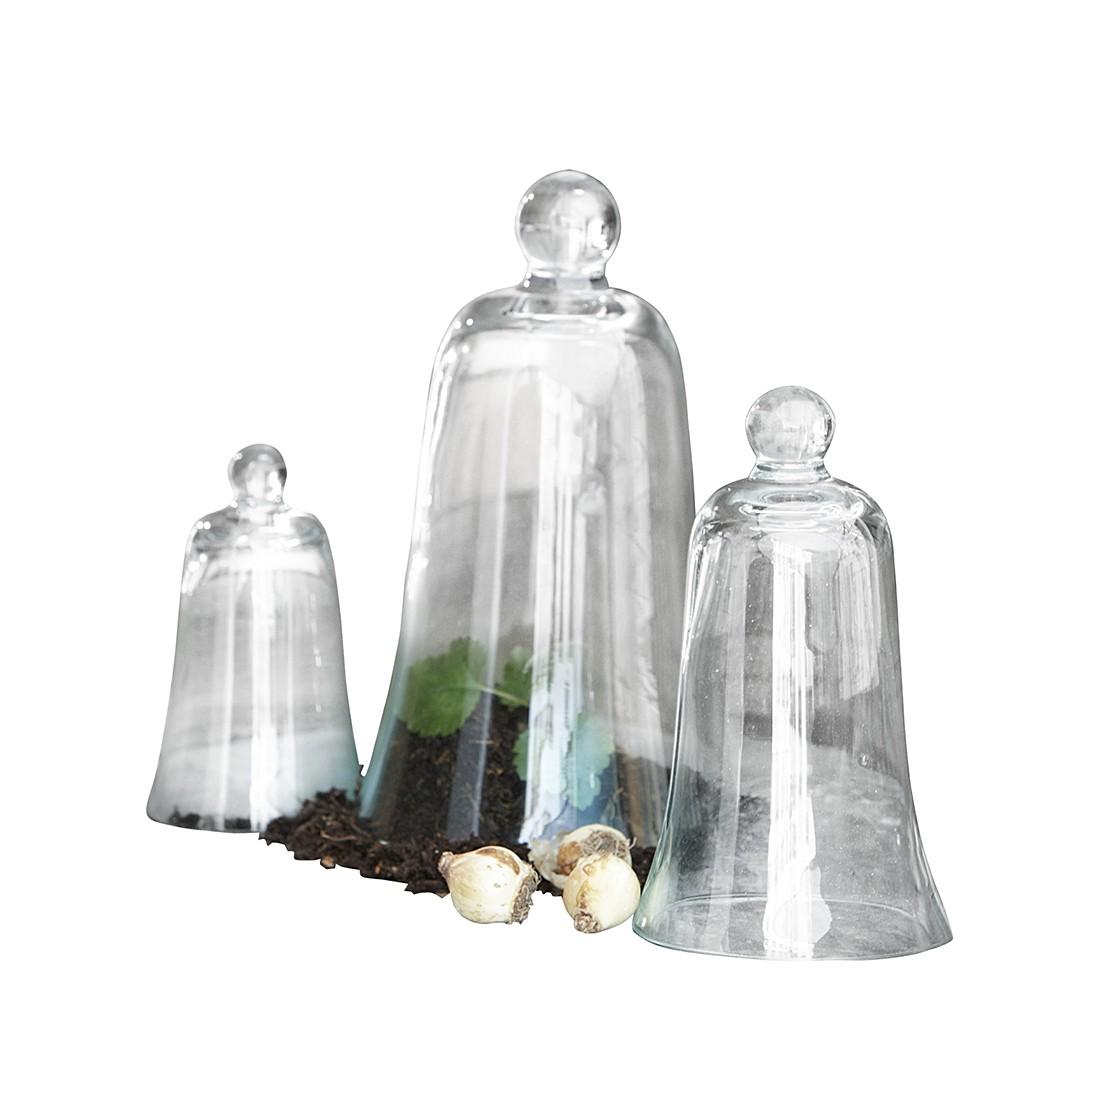 Ziehglocken 3er Set Dustin – Glas klar, Loberon jetzt bestellen